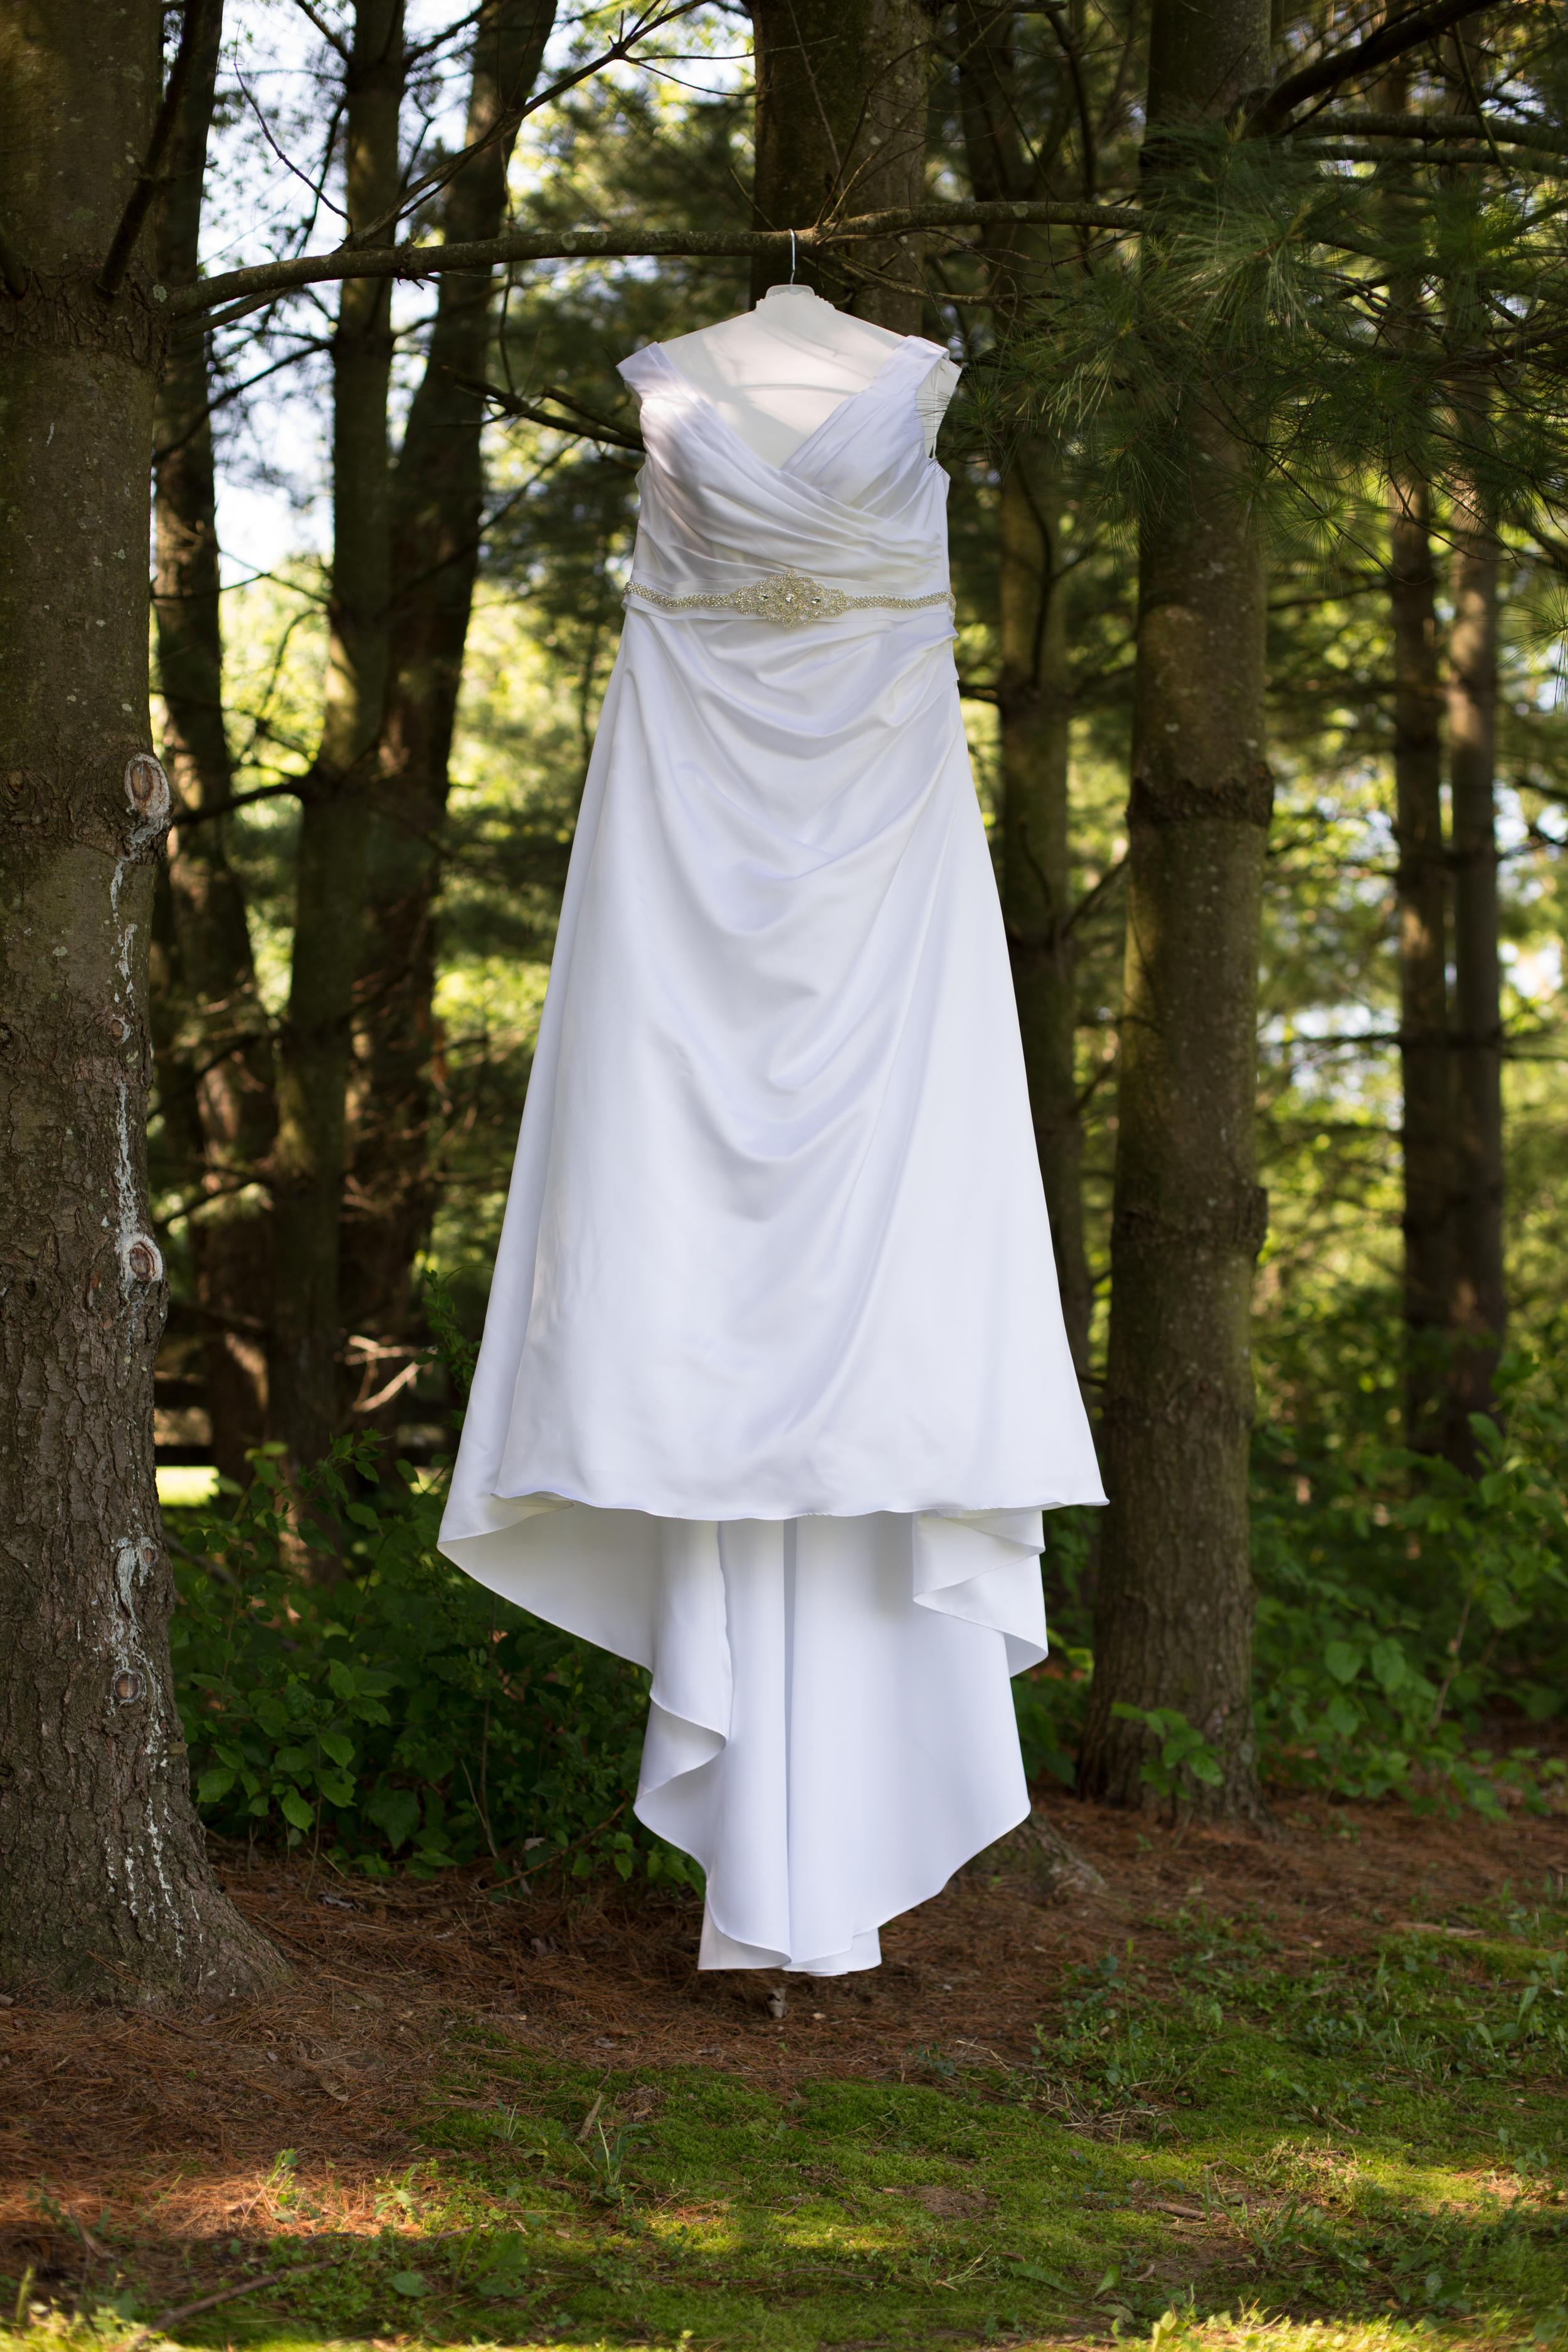 Weding_dress_portrait_synan